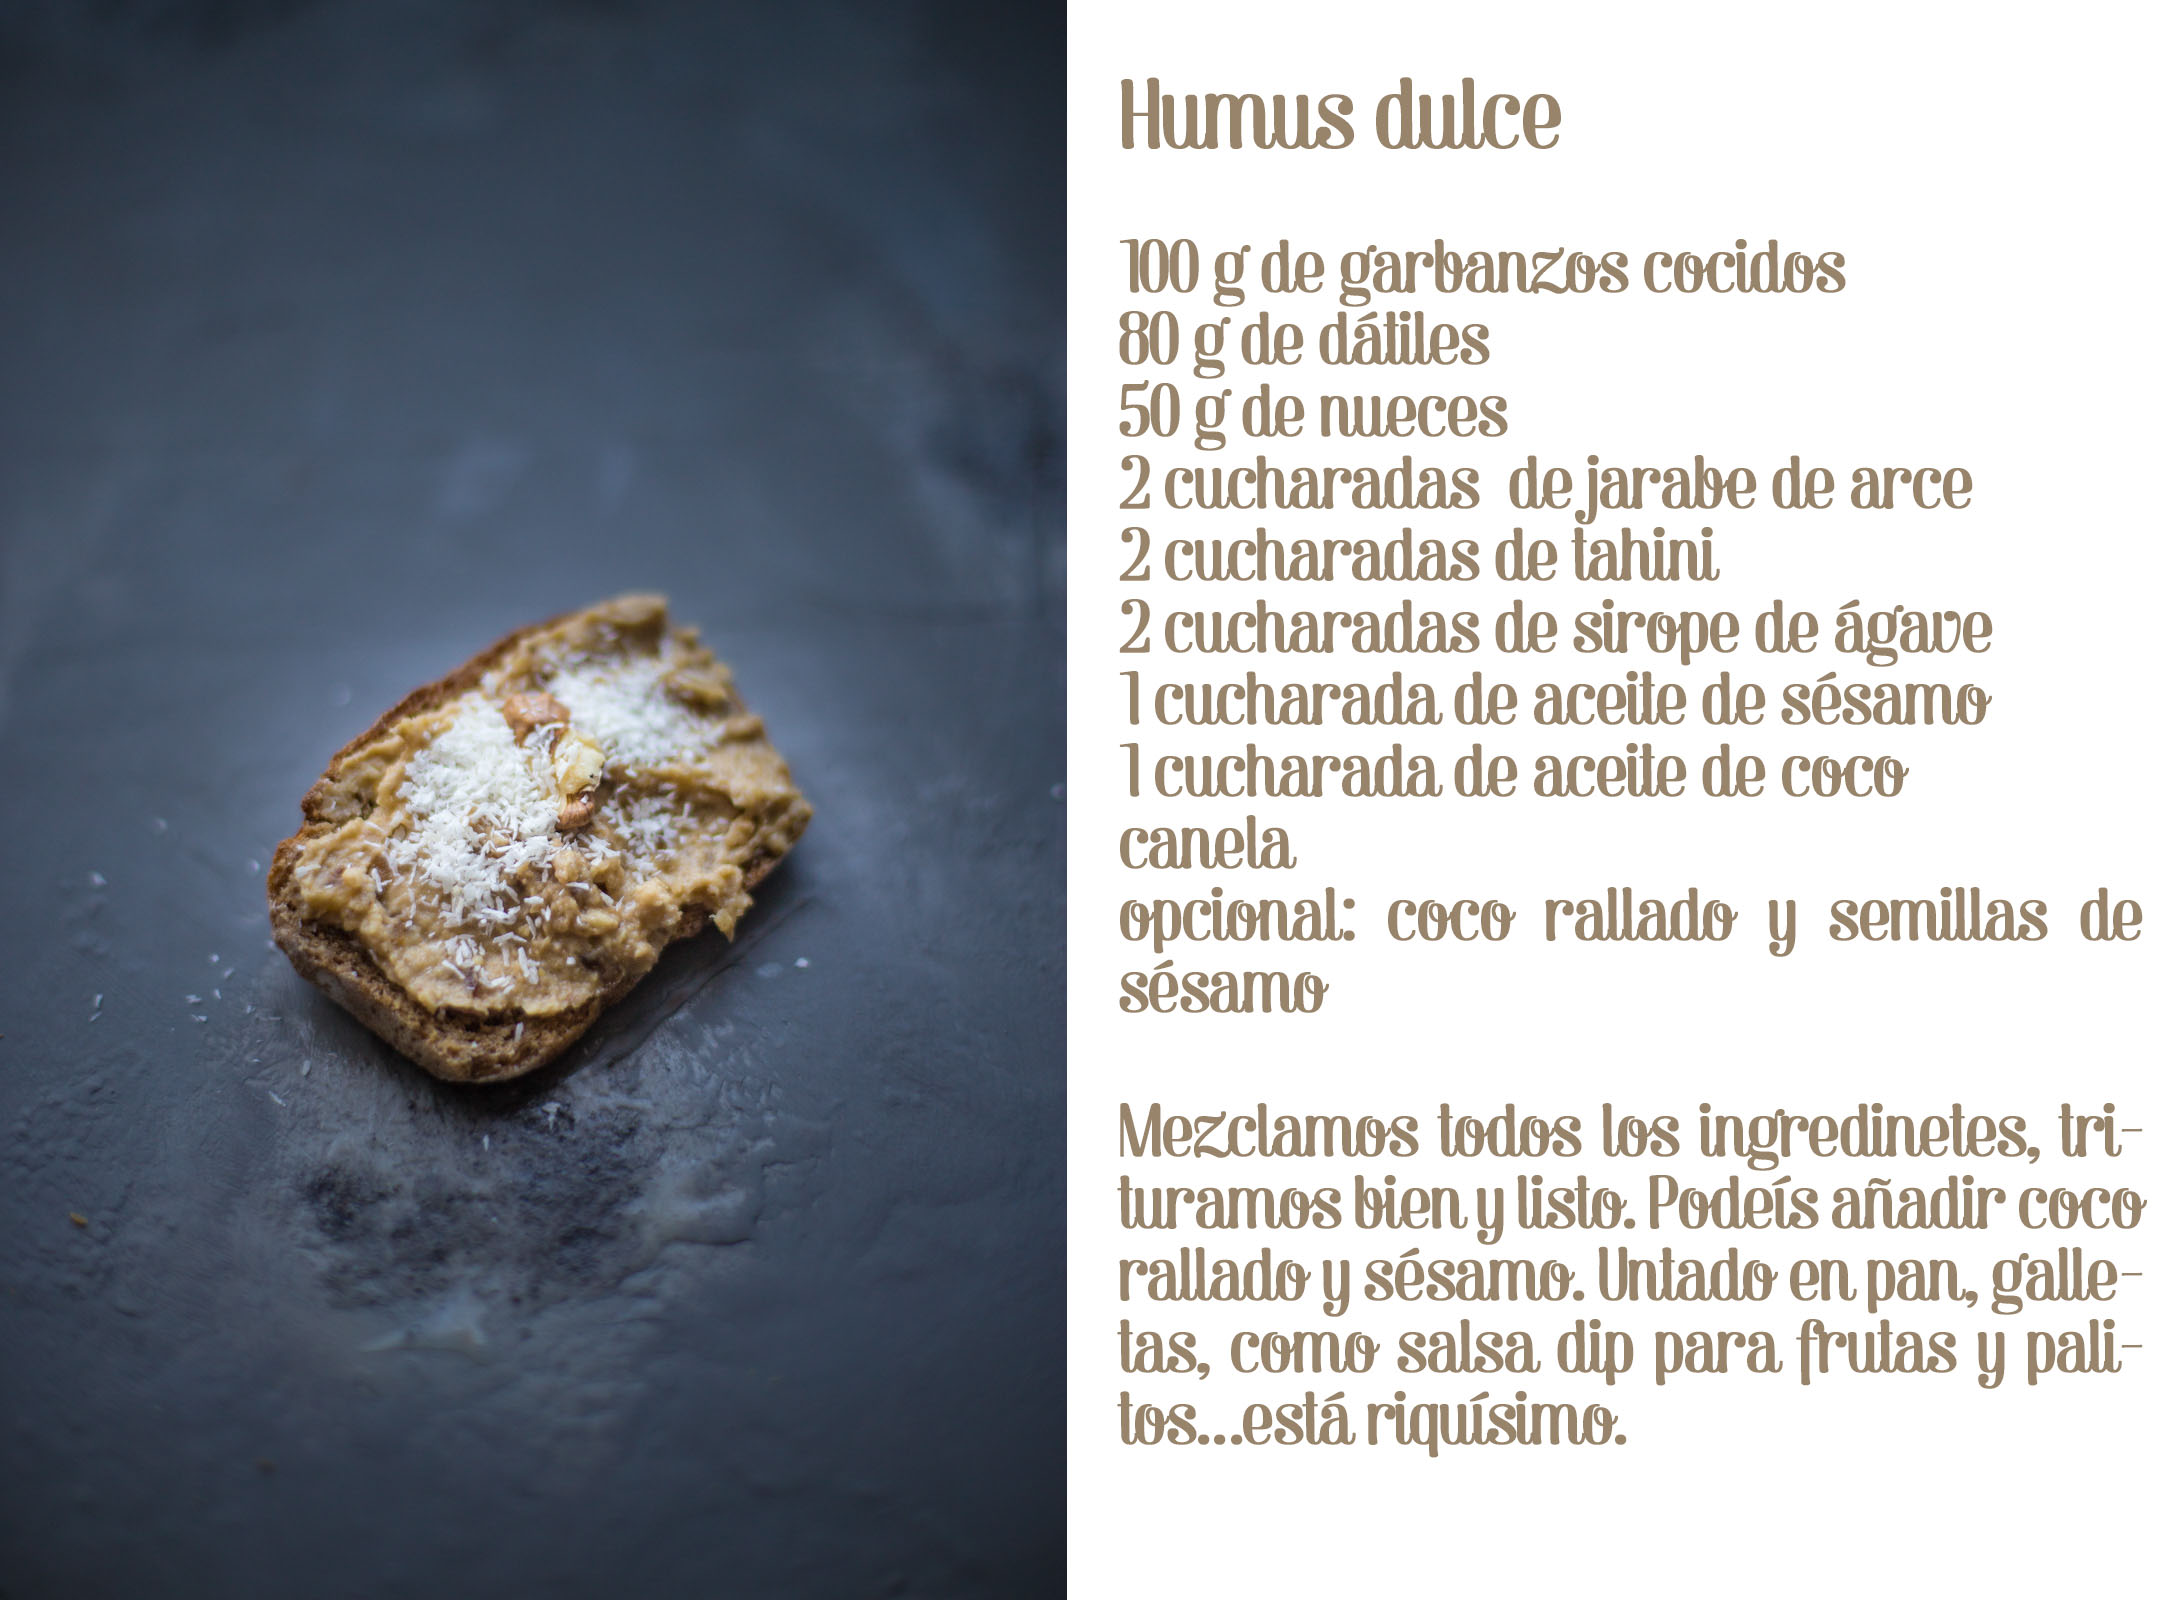 Sweet hummus